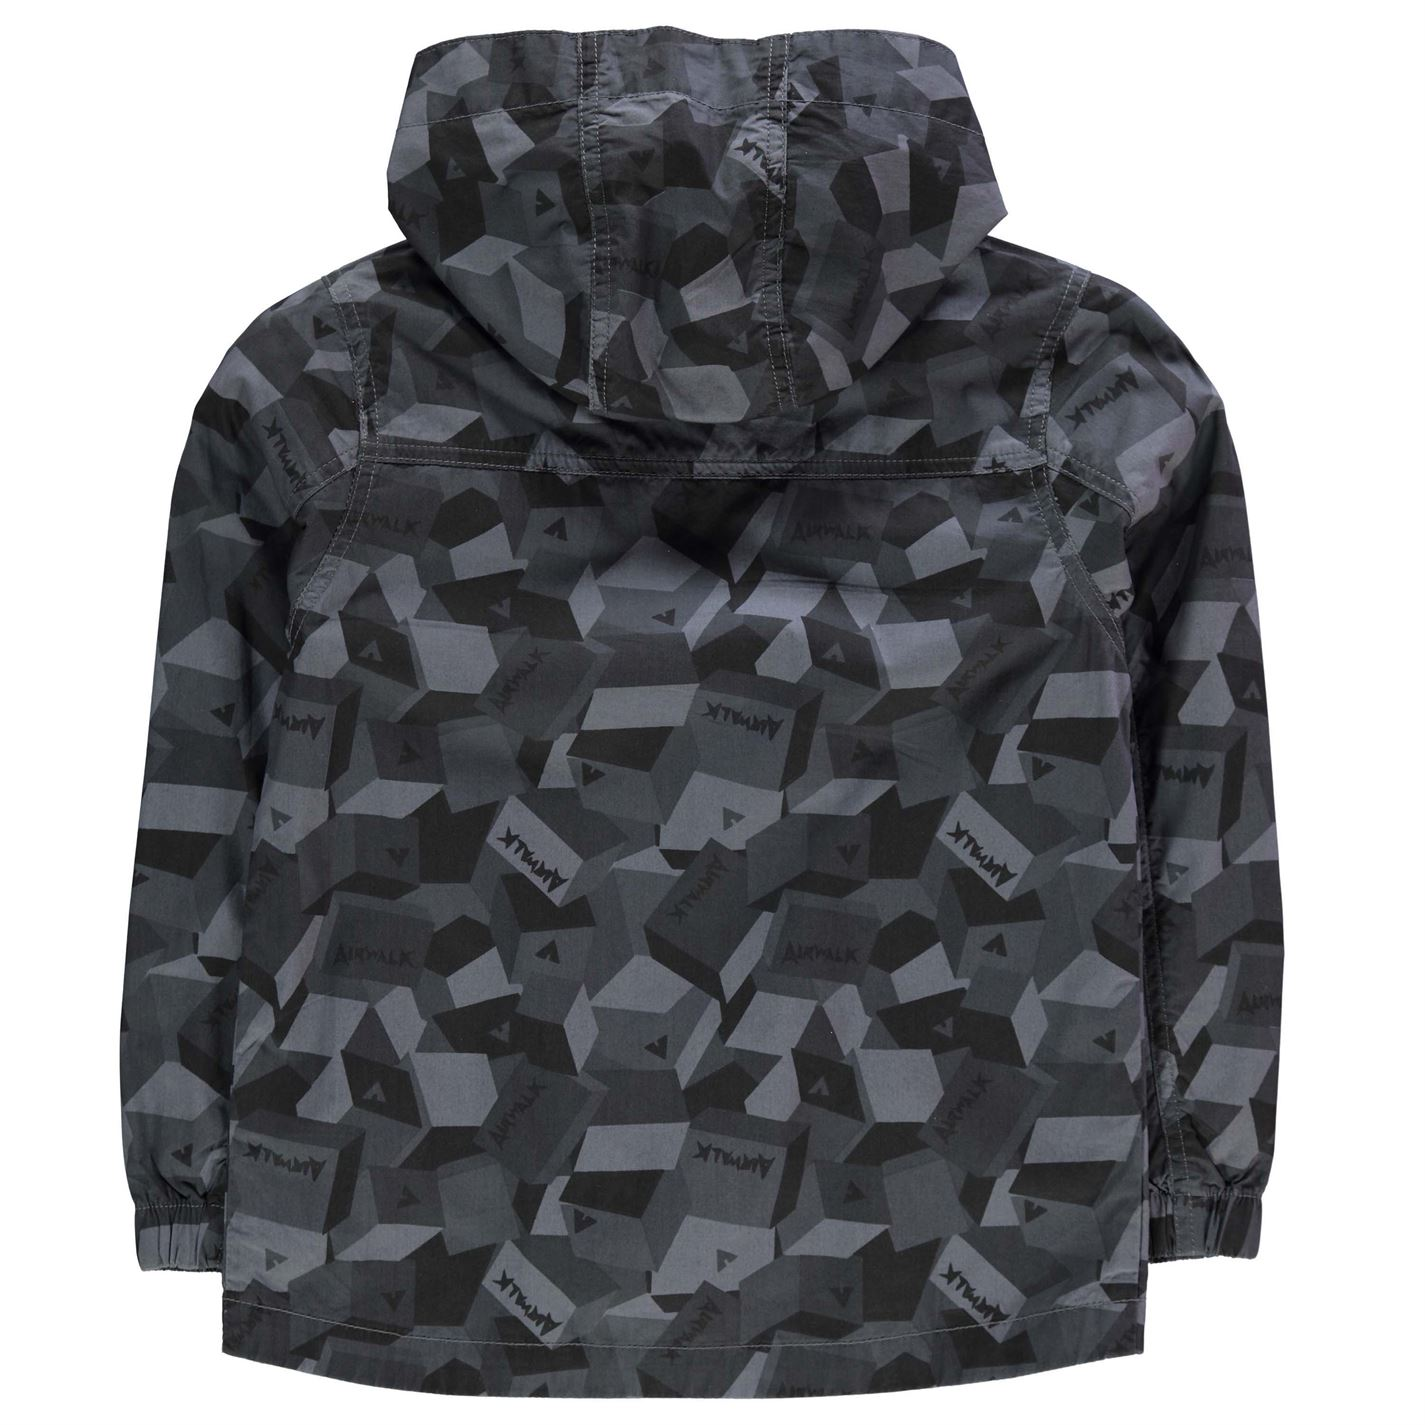 8b0e63cc4 Airwalk Childrens Camo Jacket Top Coat Boys Cotton Pattern Clothing ...